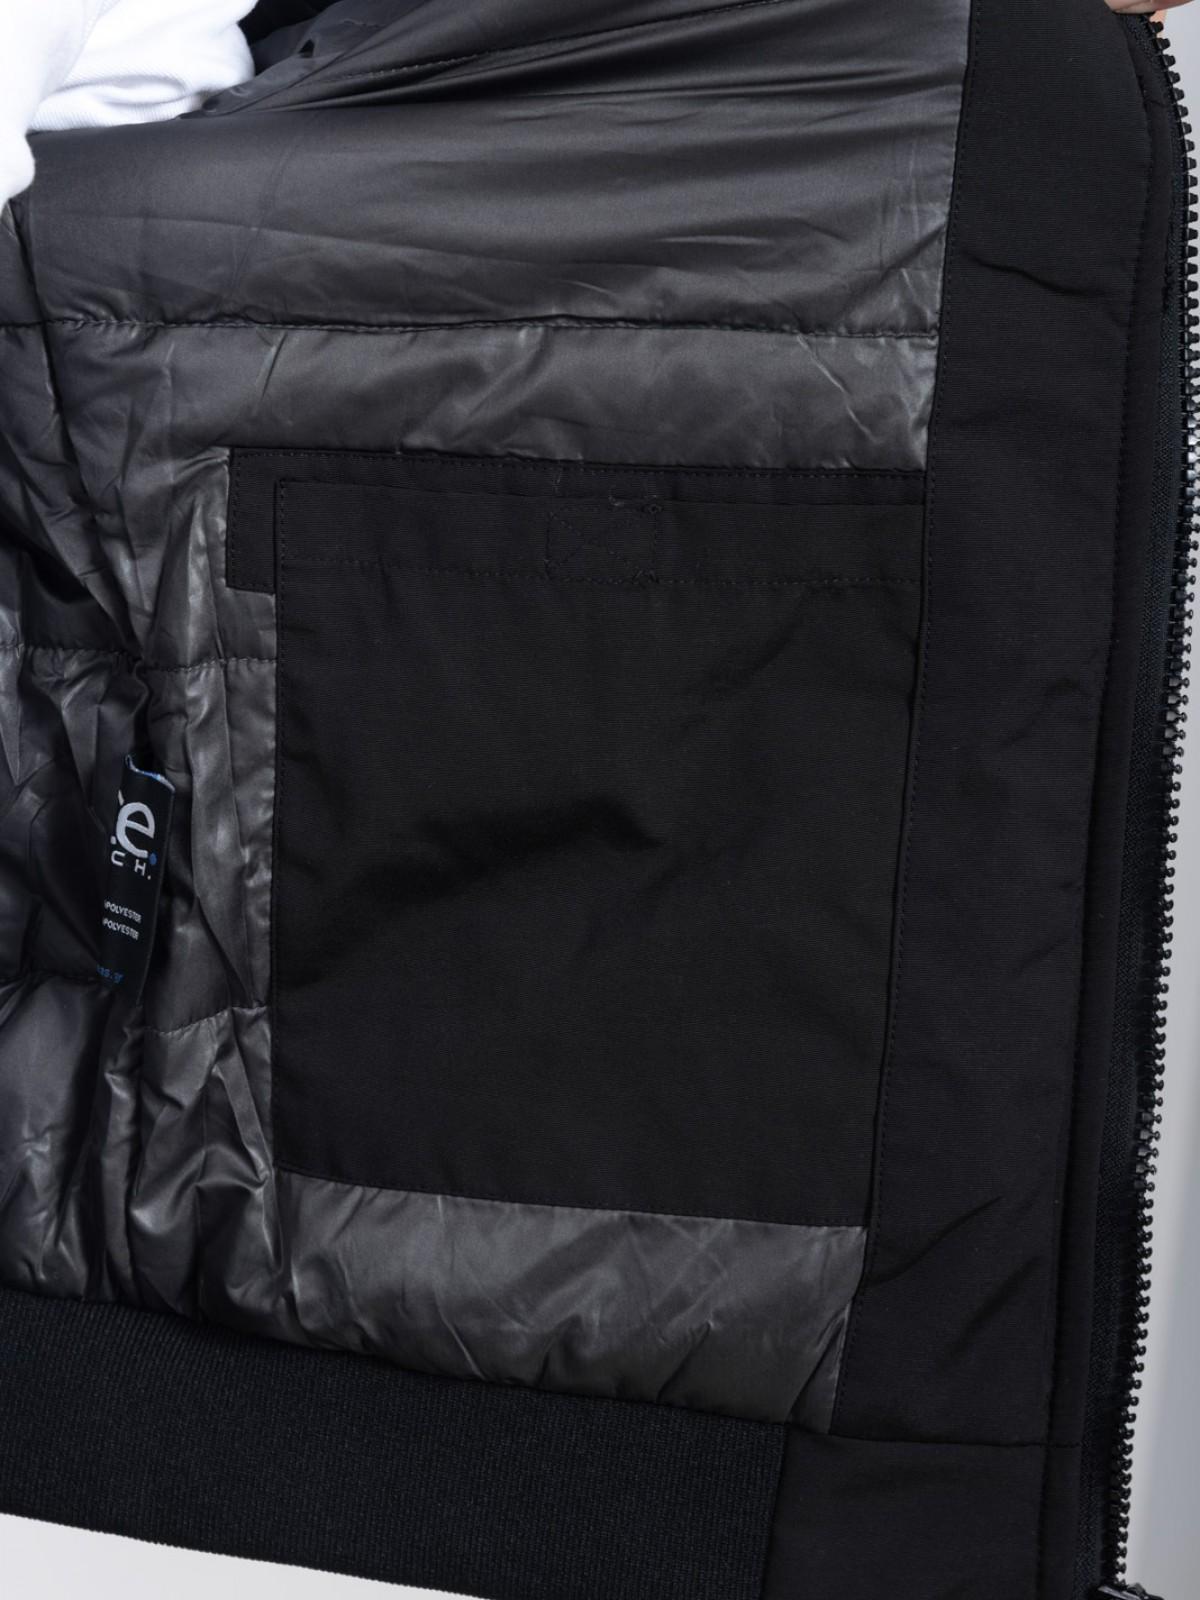 ICE TECH G821 OLIVE-BLACK - ΑΝΡΙΚΟ ΤΖΑΚΕΤ ΛΑΔΙ ΜΑΥΡΟ